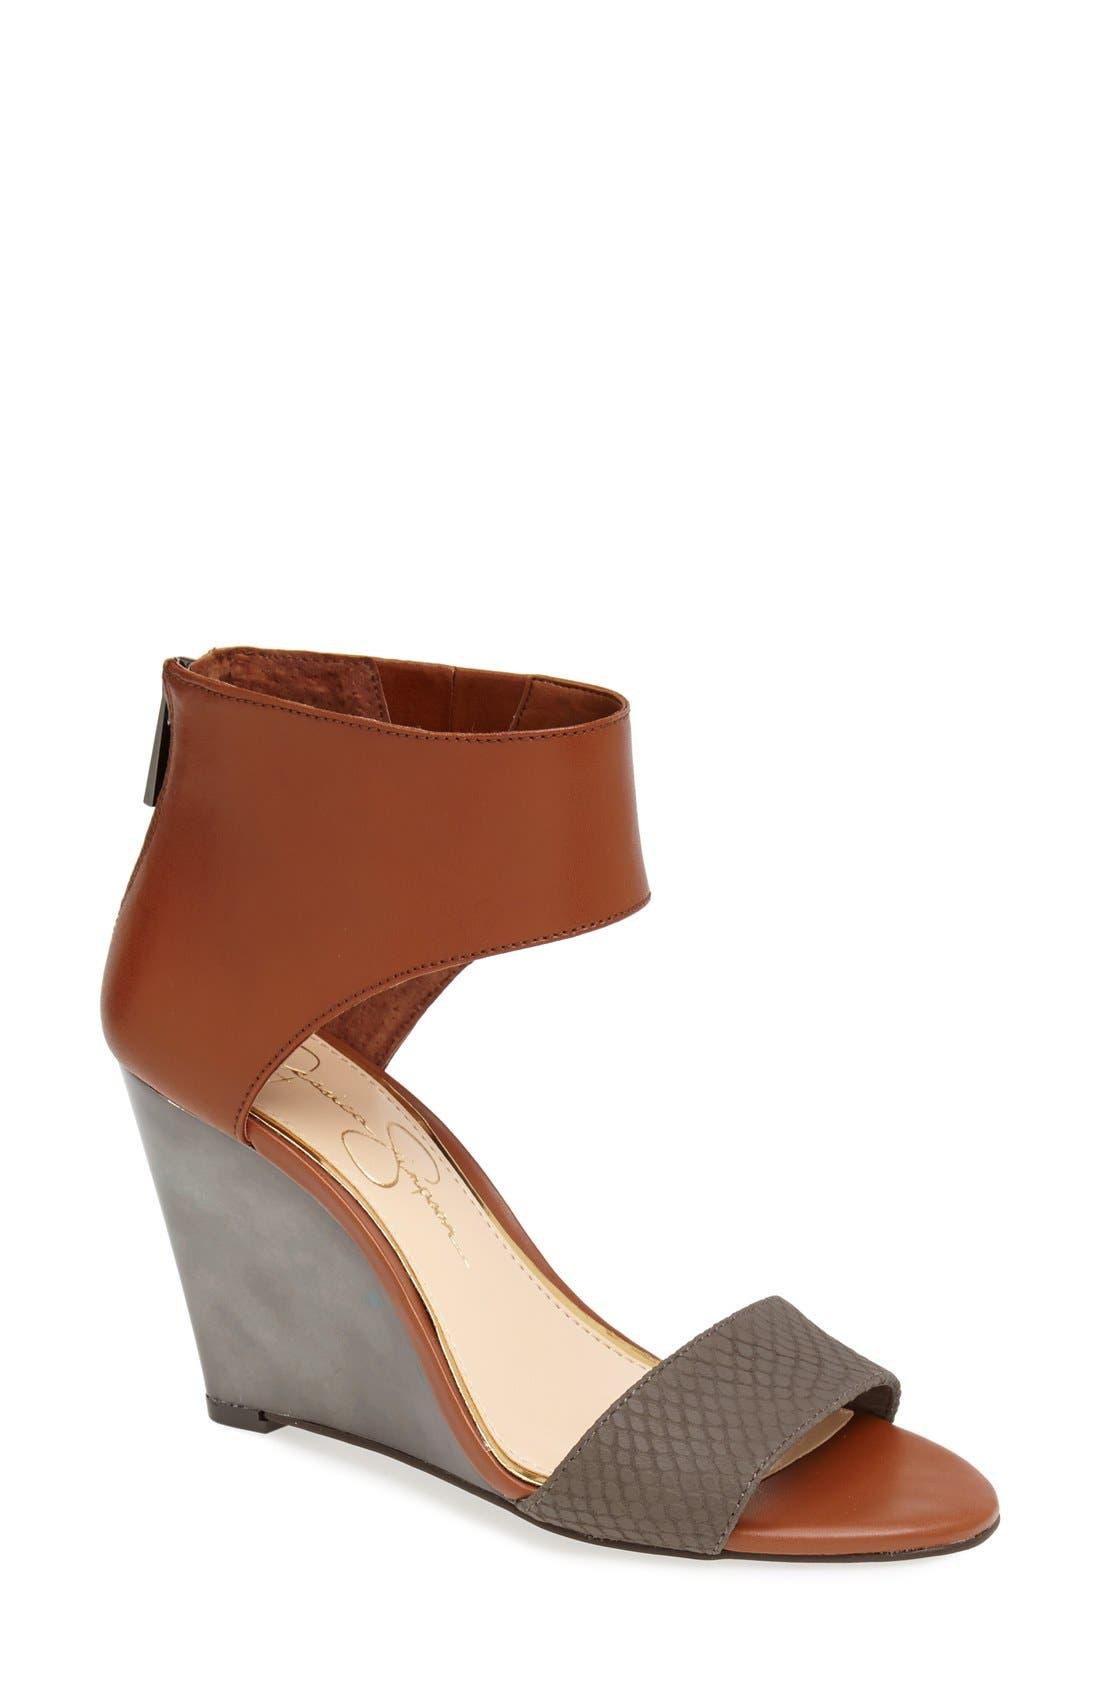 Main Image - Jessica Simpson 'Mera' Sandal (Women)